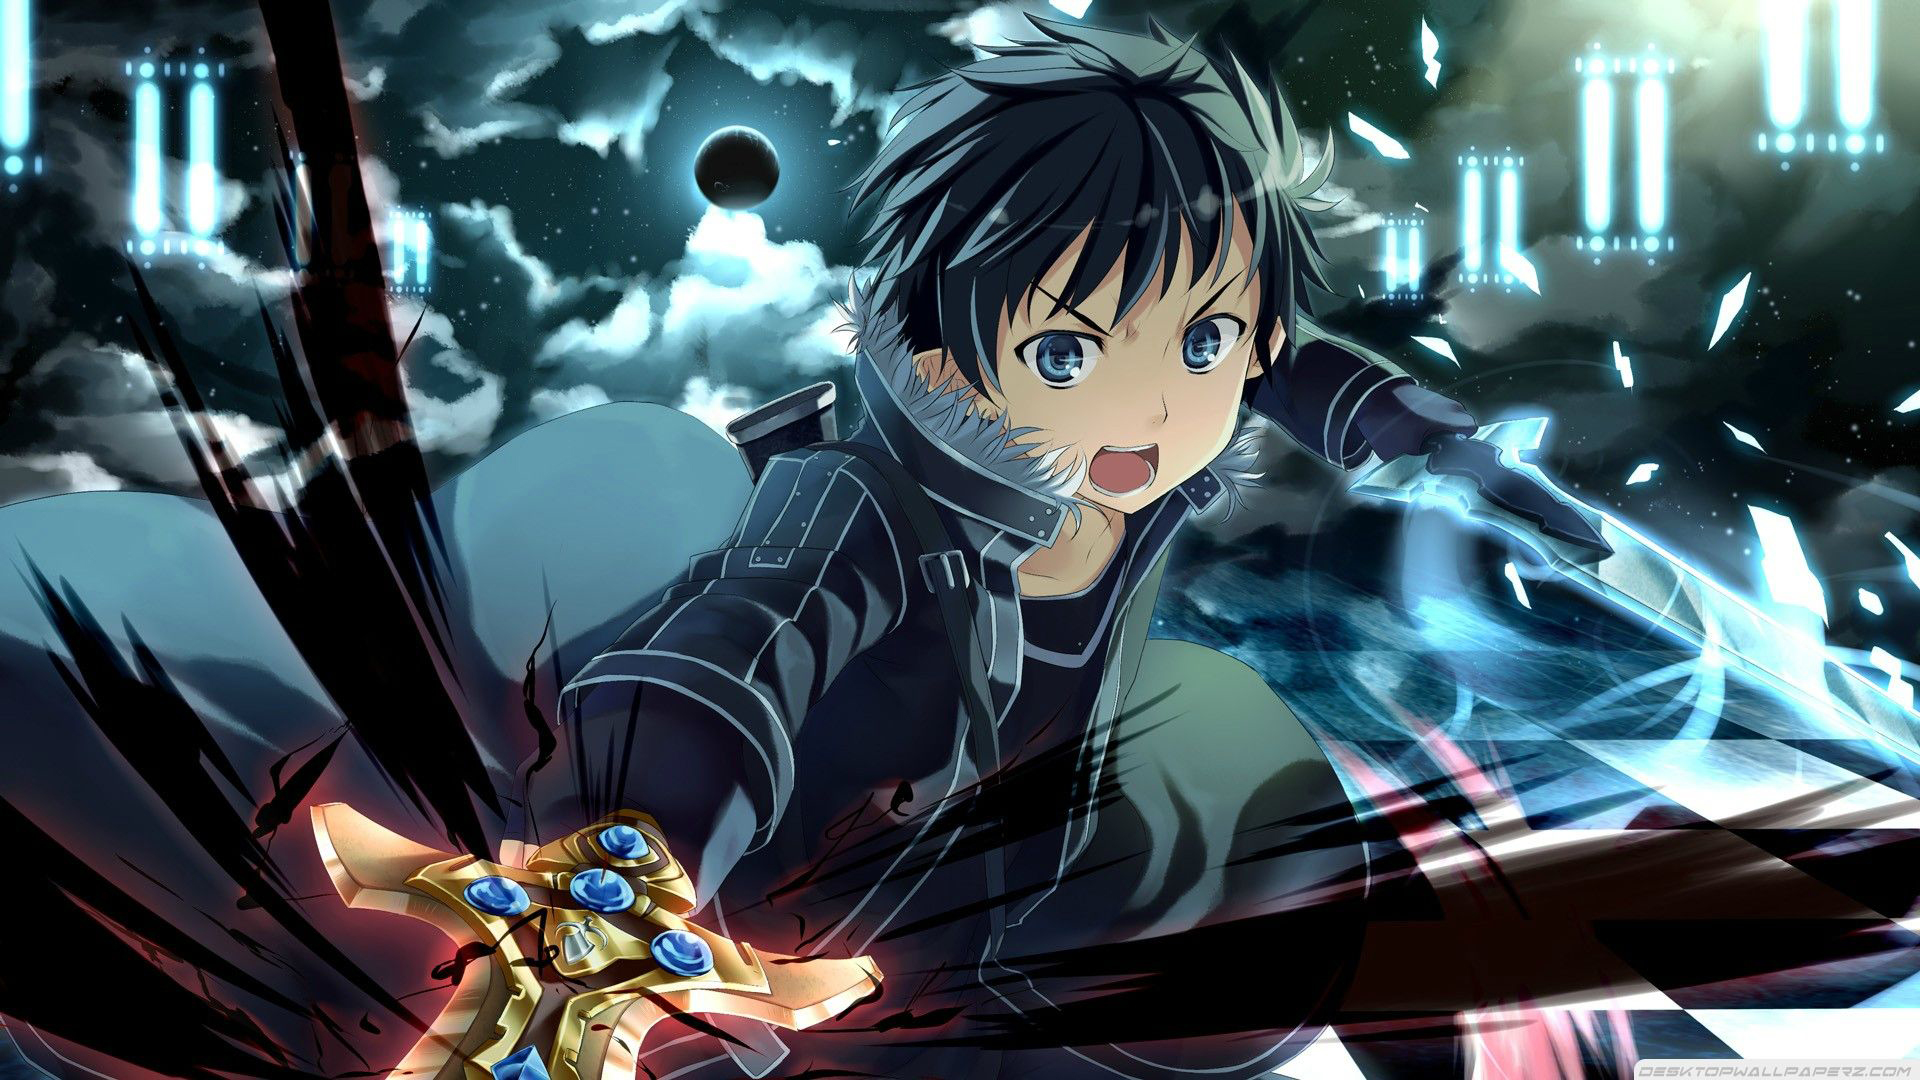 152 anime wallpaper examples for your desktop background - Anime backdrop wallpaper ...